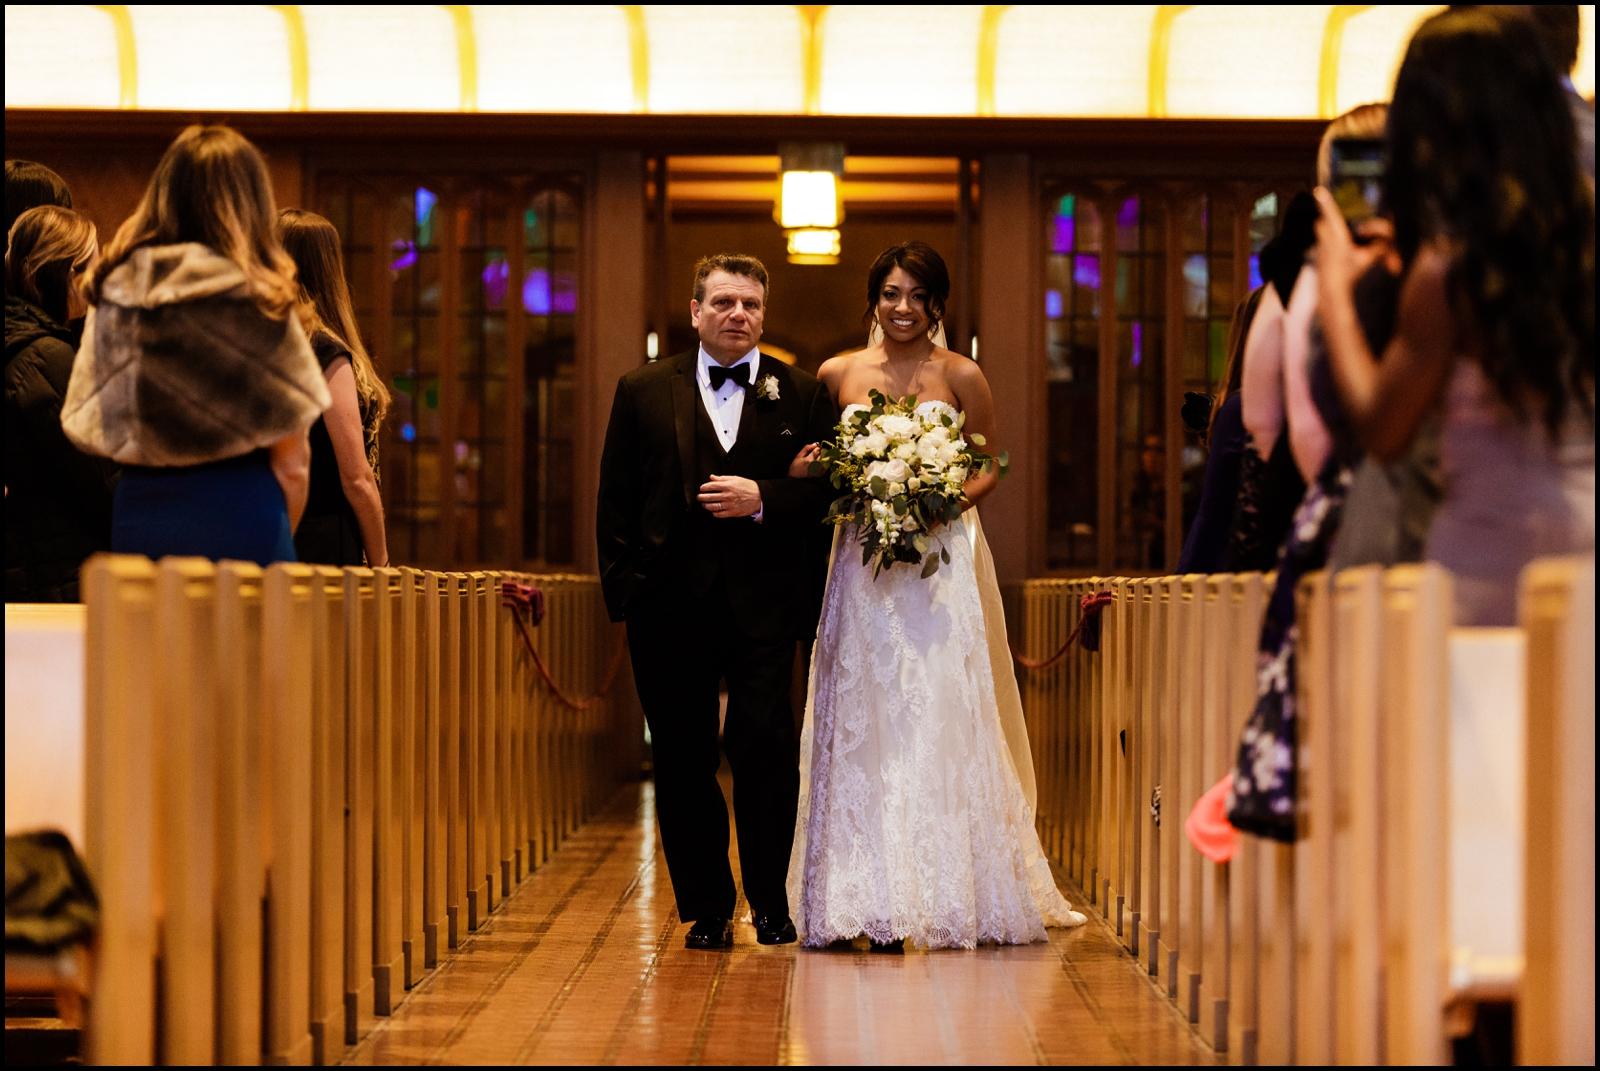 Chicago Wedding- Alice Millar Chapel Ceremony, London House Reception_0076.jpg